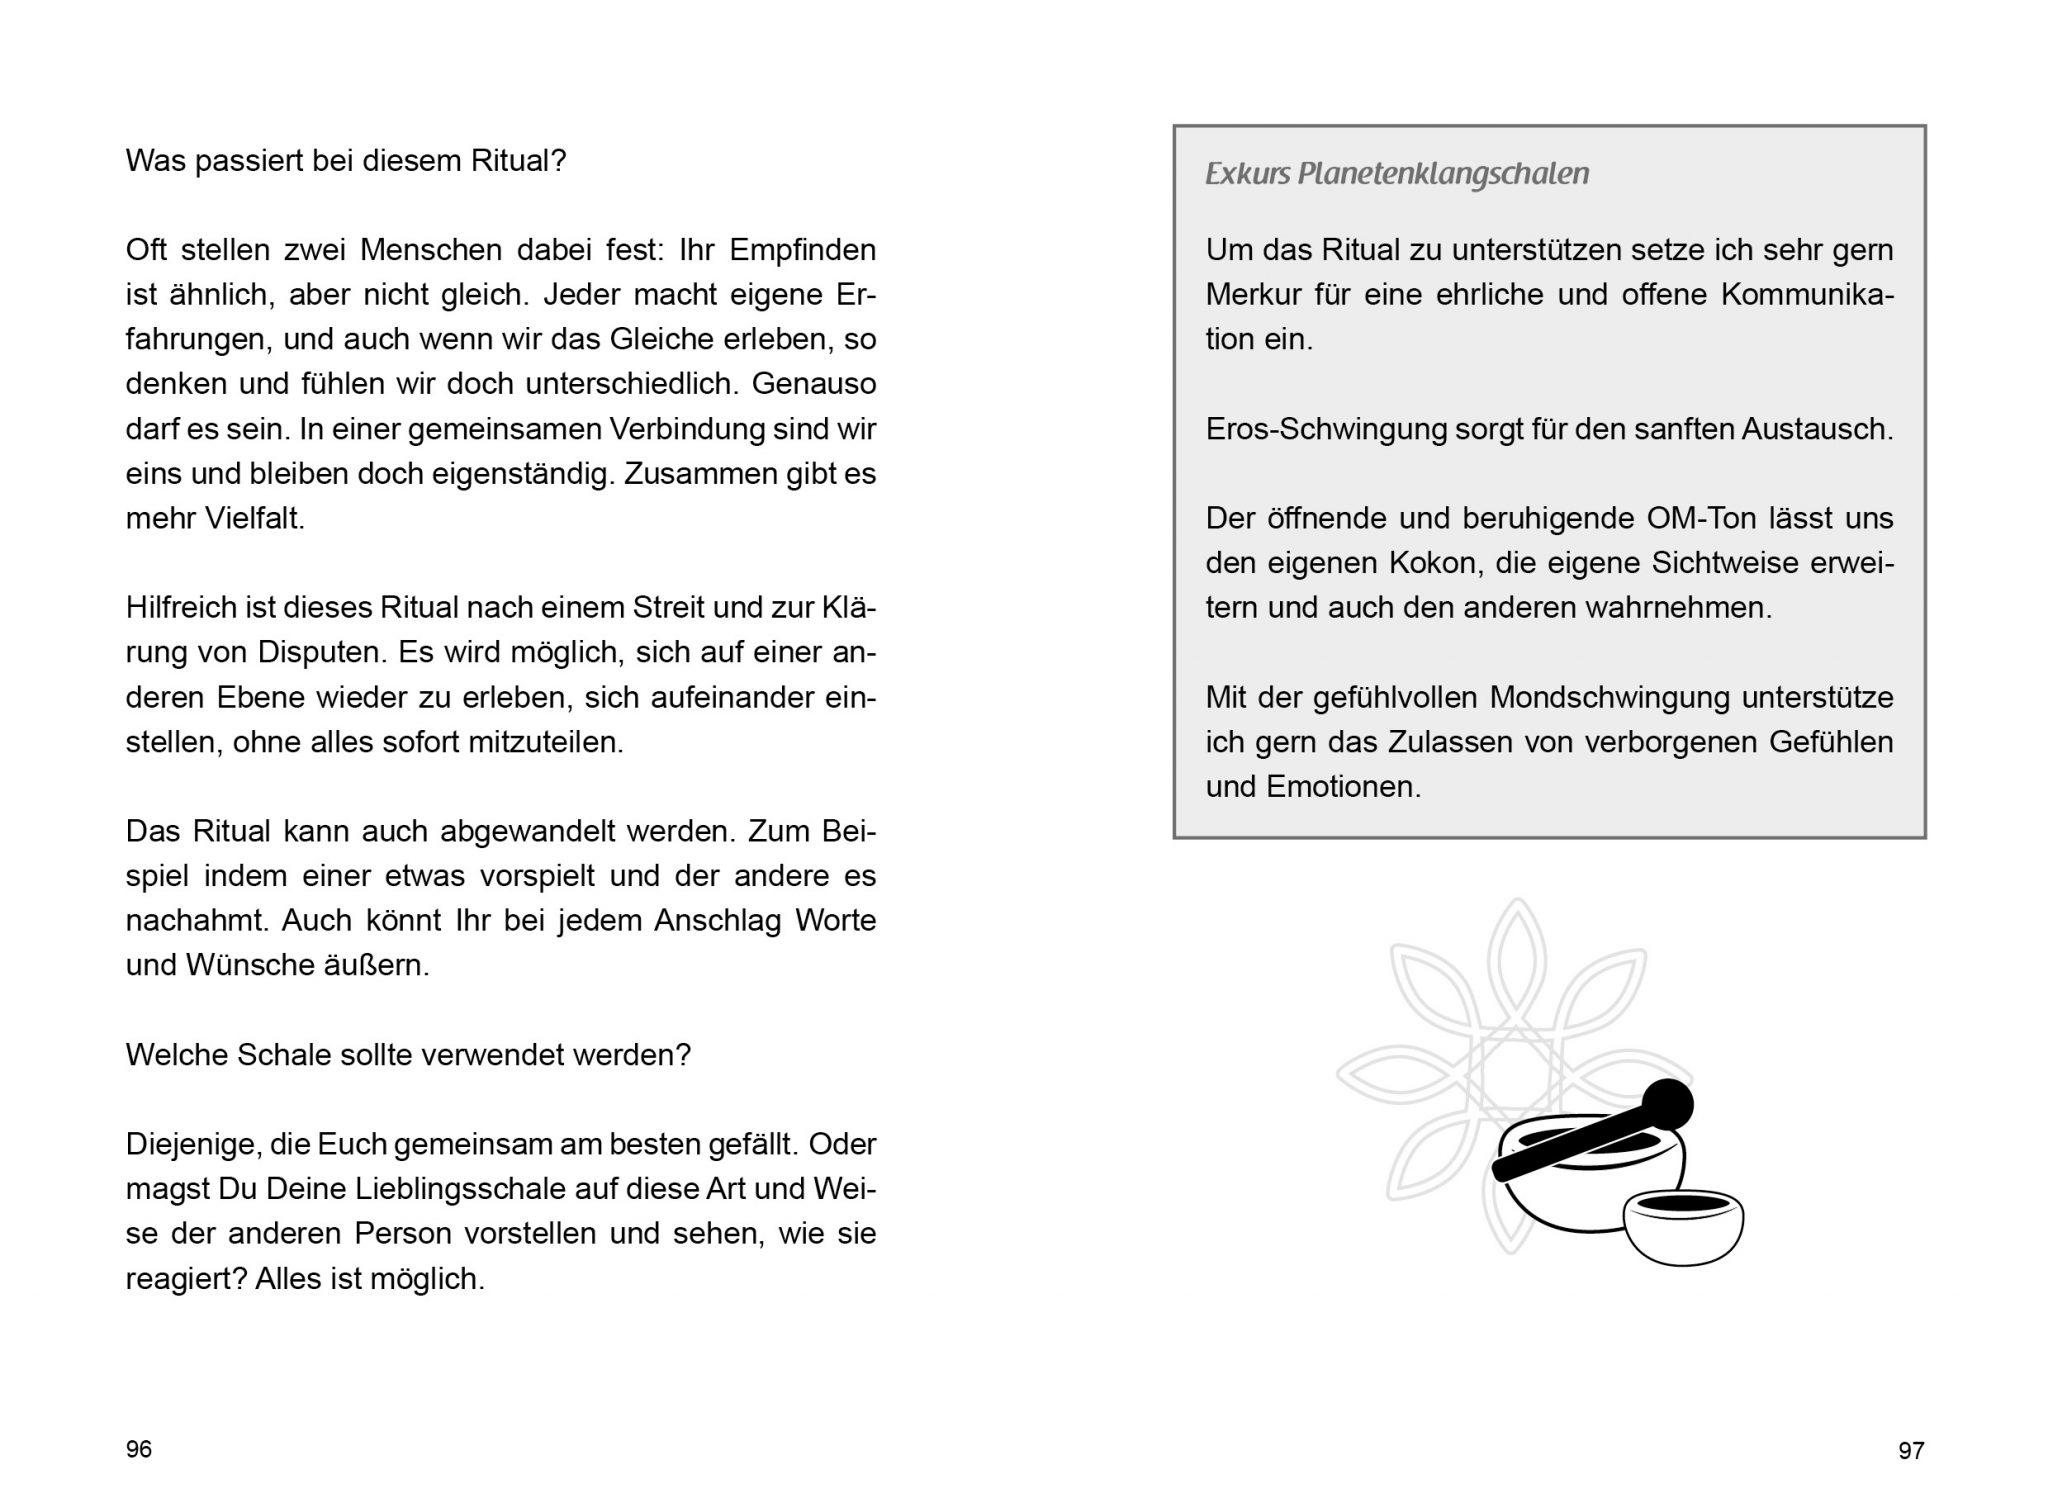 10_Seelenmomente_Seiten_96_97_DS